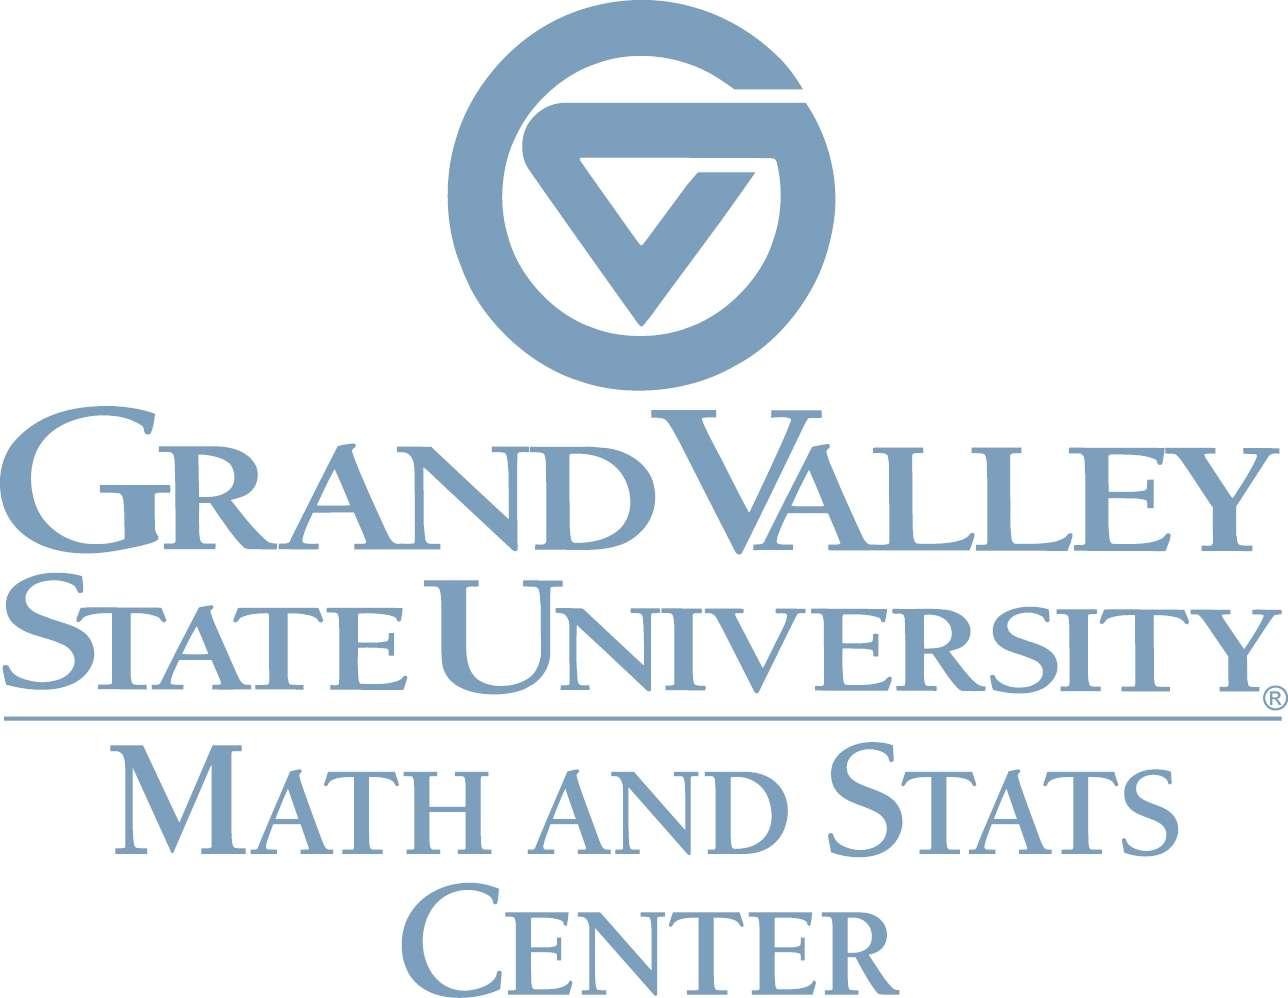 Statistics Center - Grand Valley State University